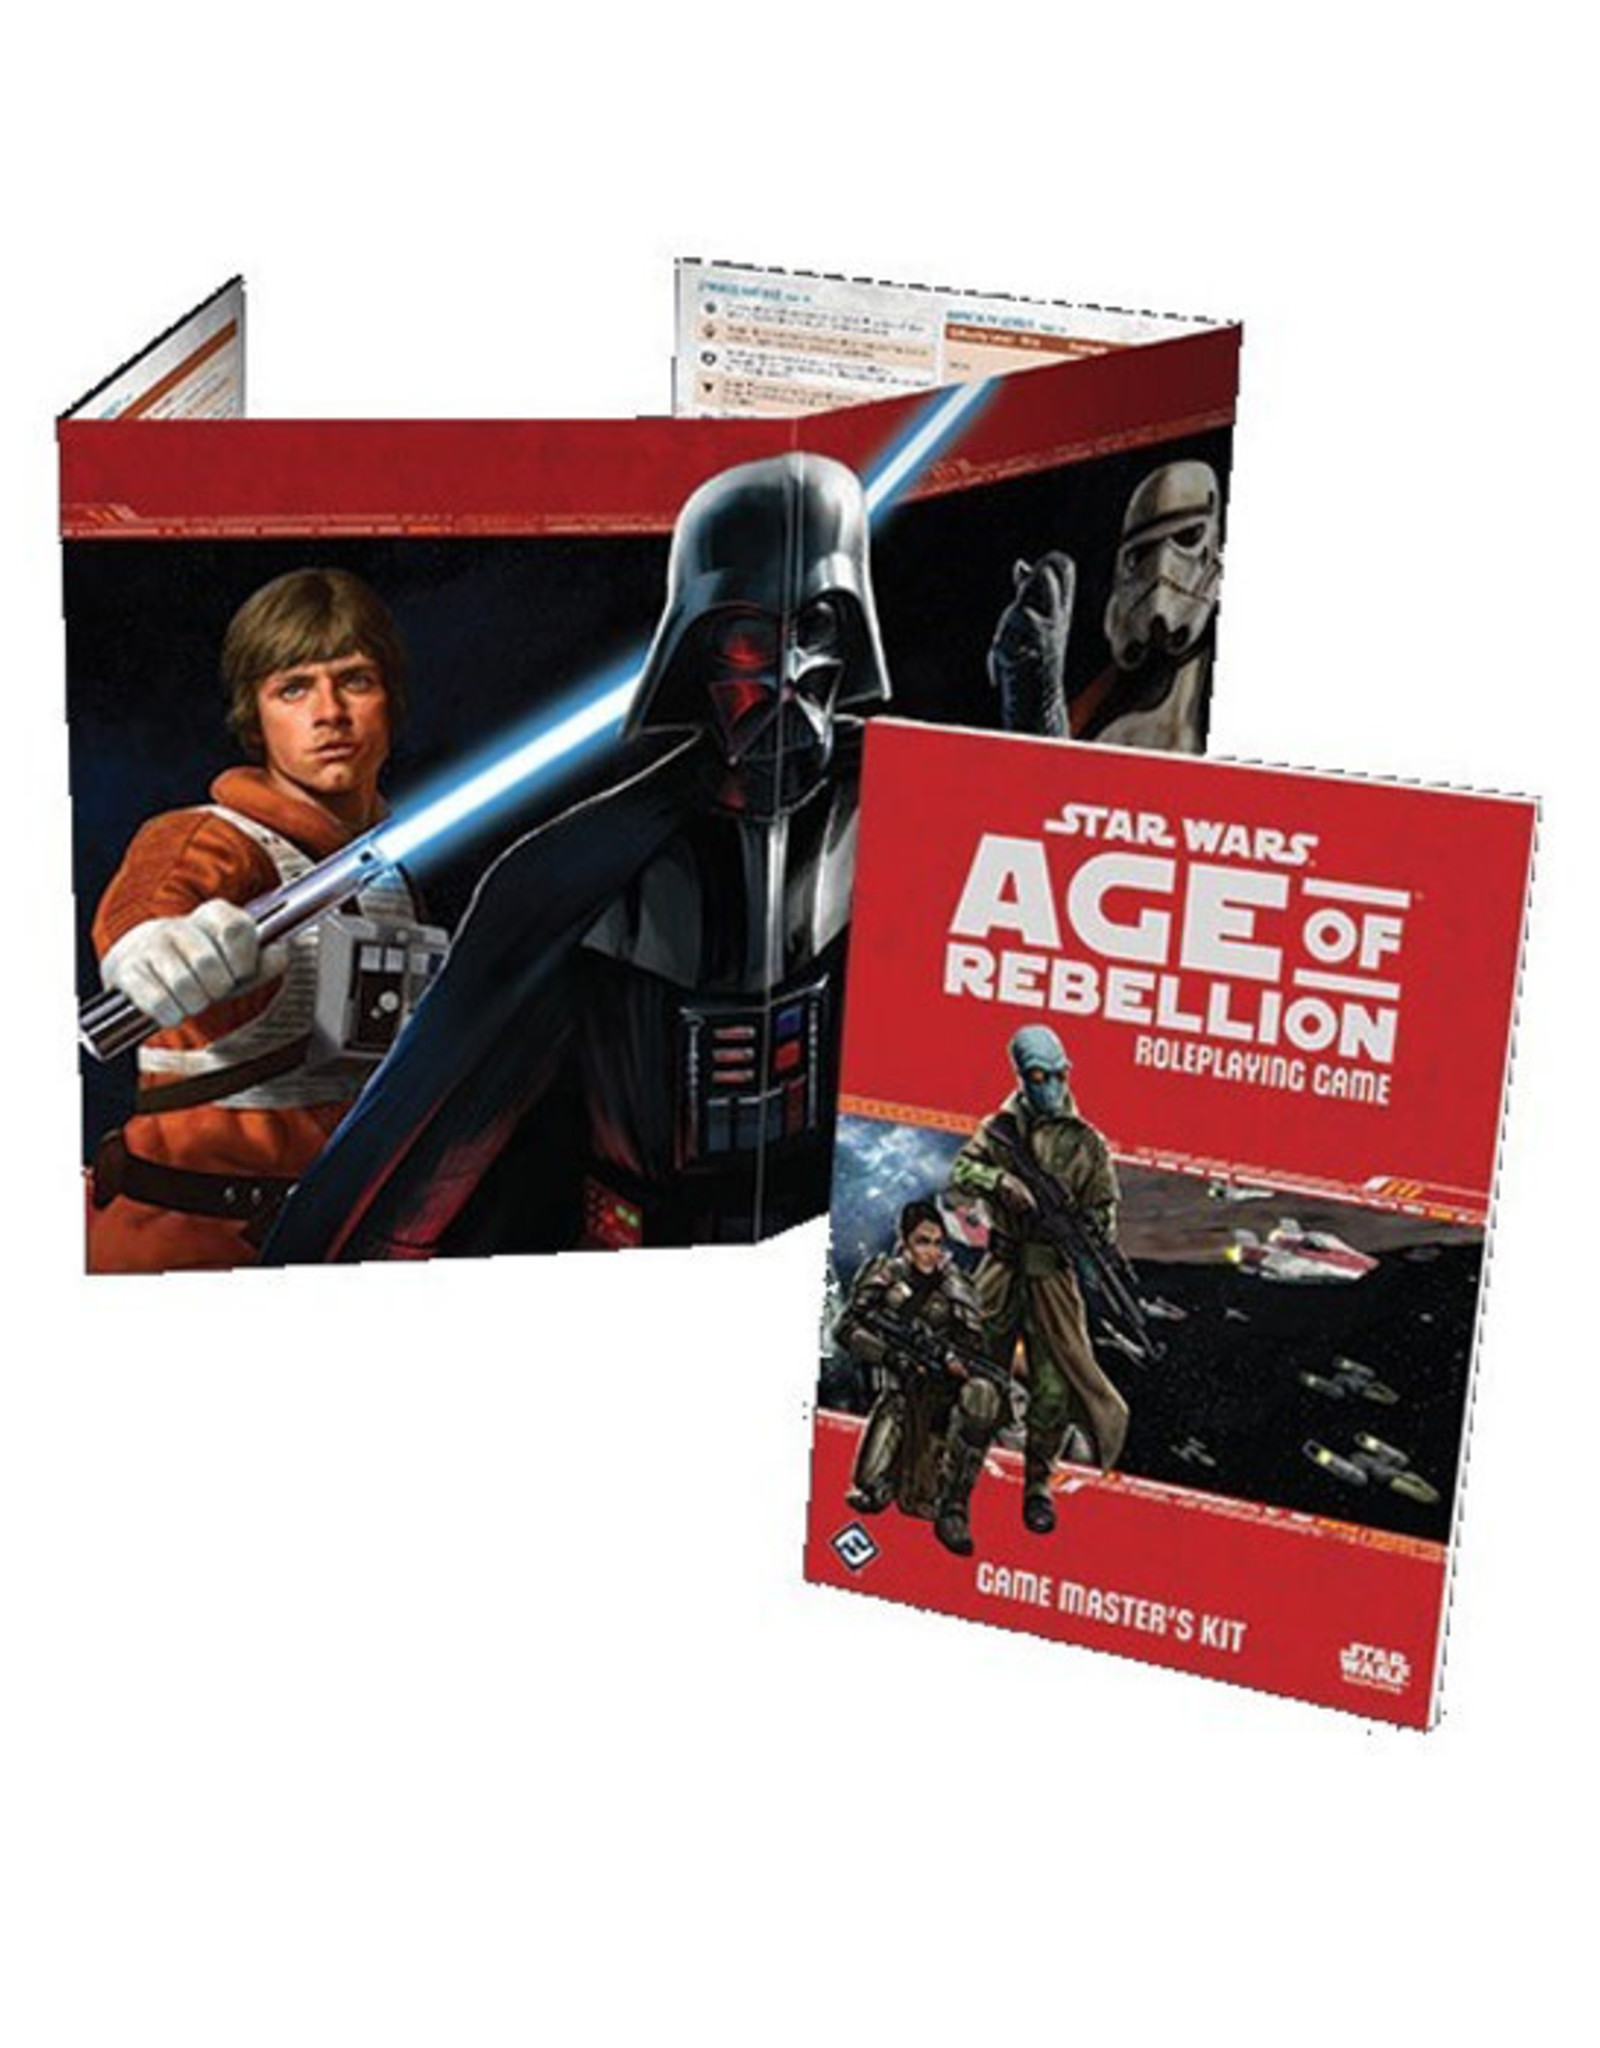 Fantasy Flight Games Star Wars: Age of Rebellion - Game Master's Kit